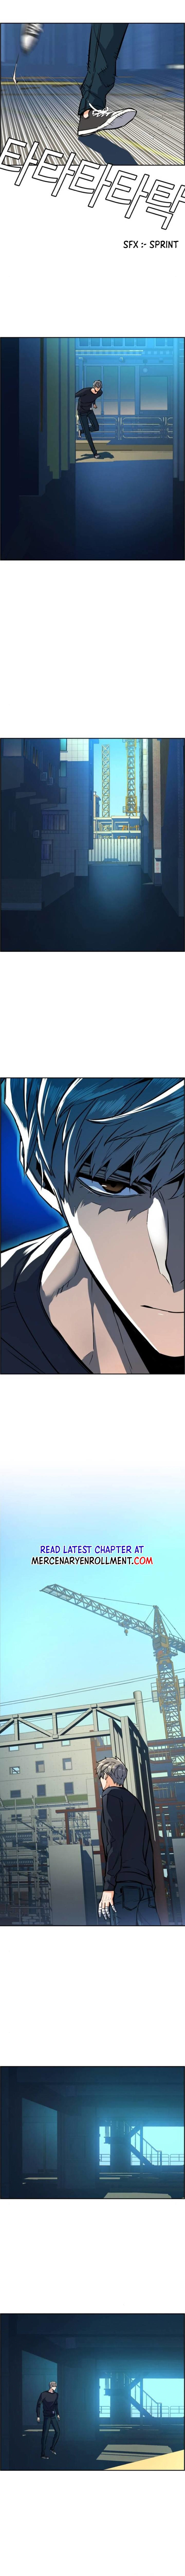 Mercenary Enrollment Chapter 52 page 8 - Mangakakalot